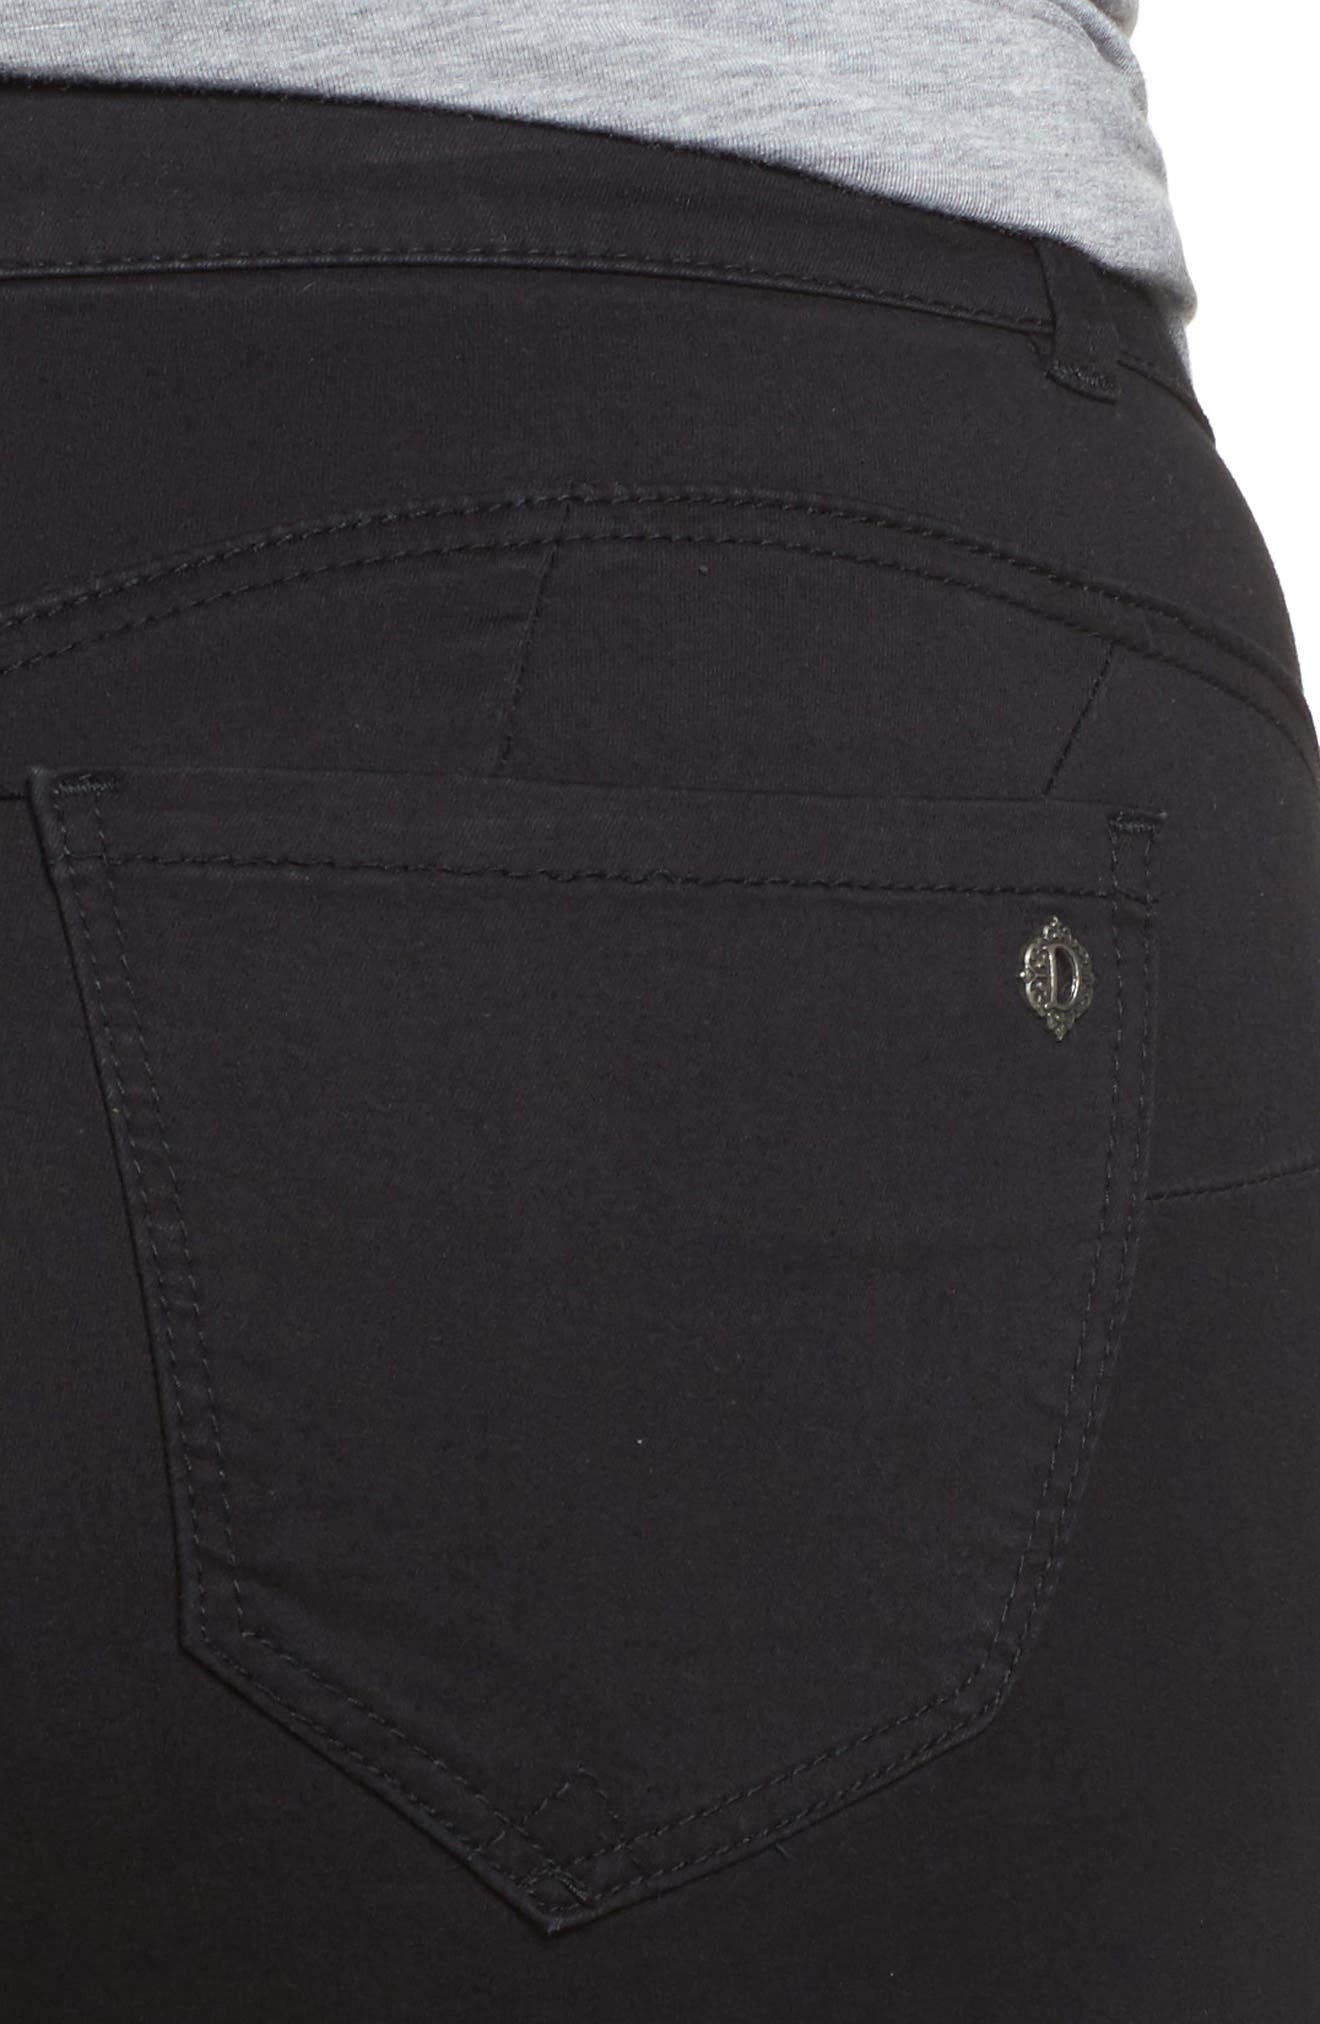 Ab-Solution Stretch Straight Leg Jeans,                             Alternate thumbnail 4, color,                             BLACK